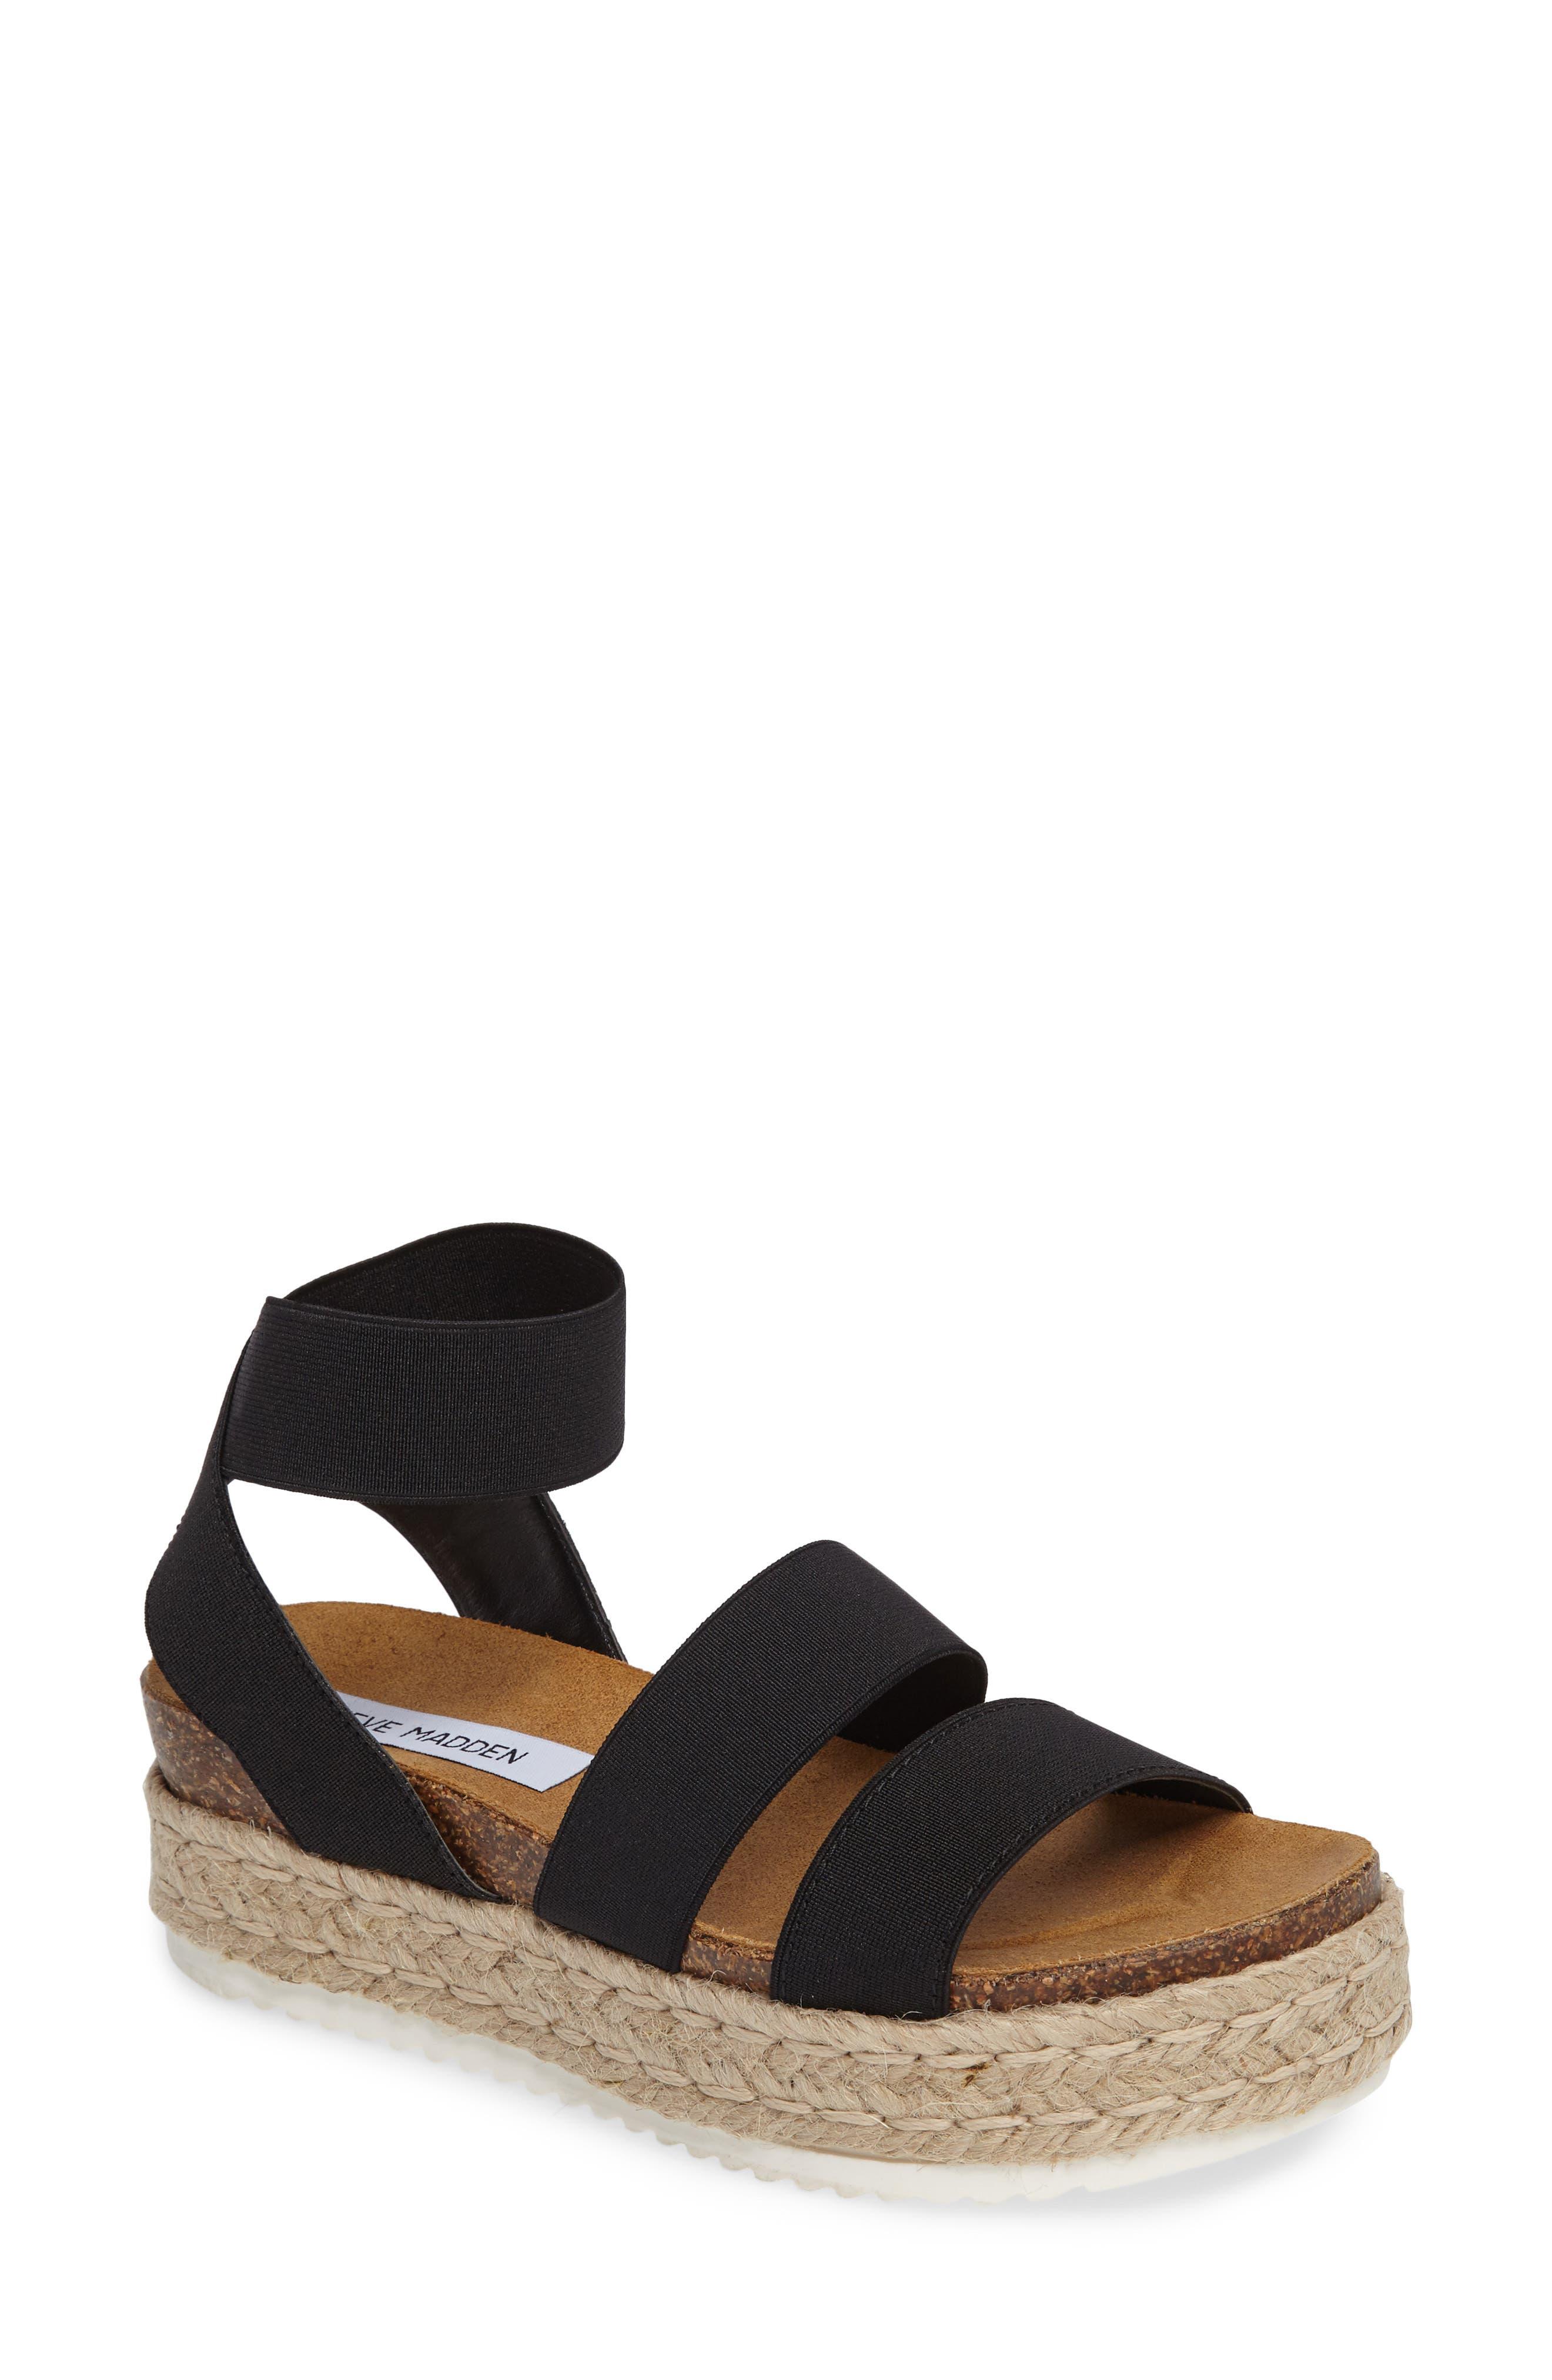 Kimmie Flatform Sandal,                             Main thumbnail 1, color,                             001